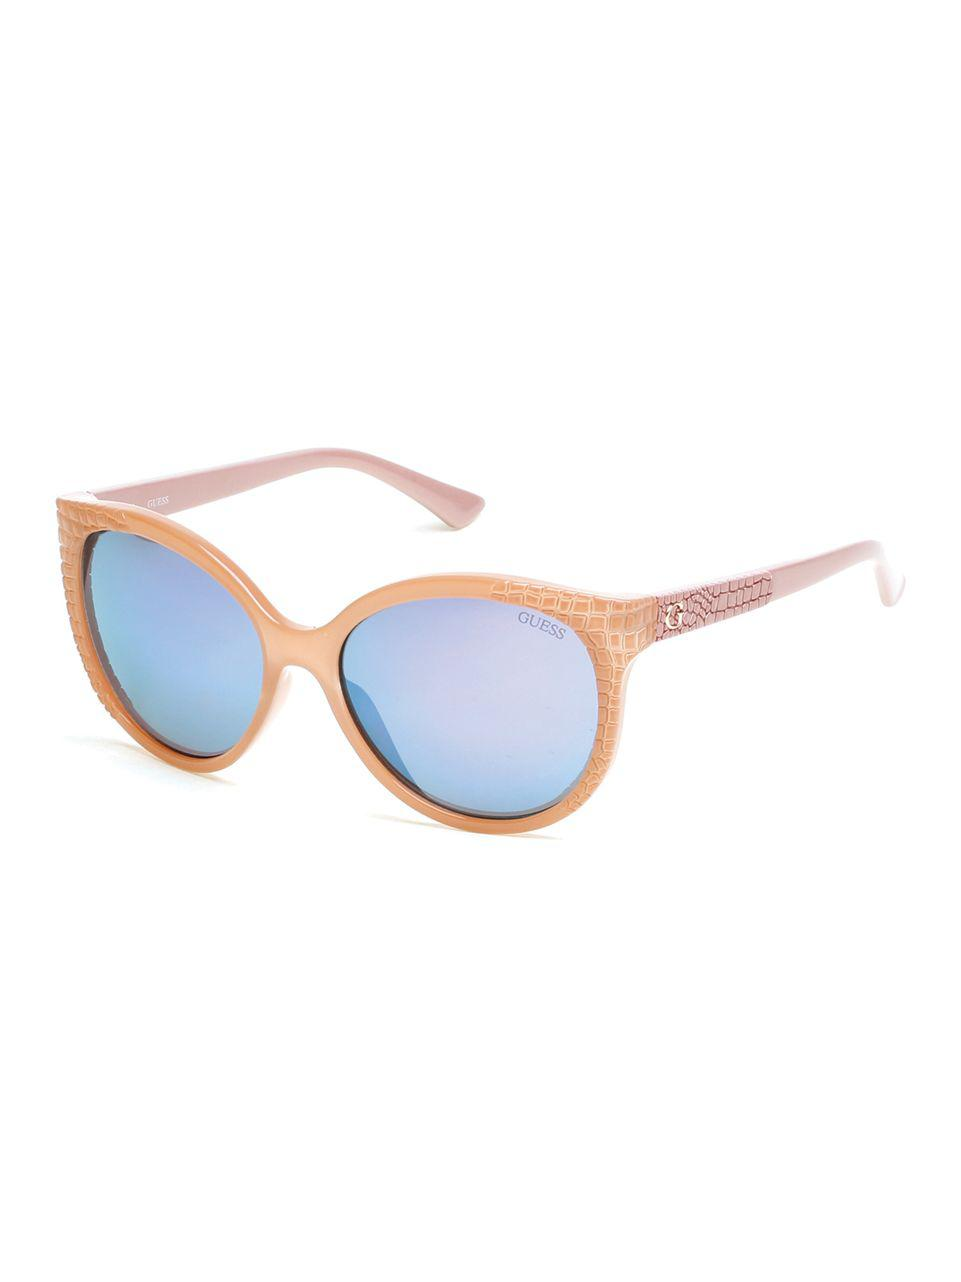 57x Gf0297 sol Guess mujer Gafas 56 para beige de color tqEx5wO